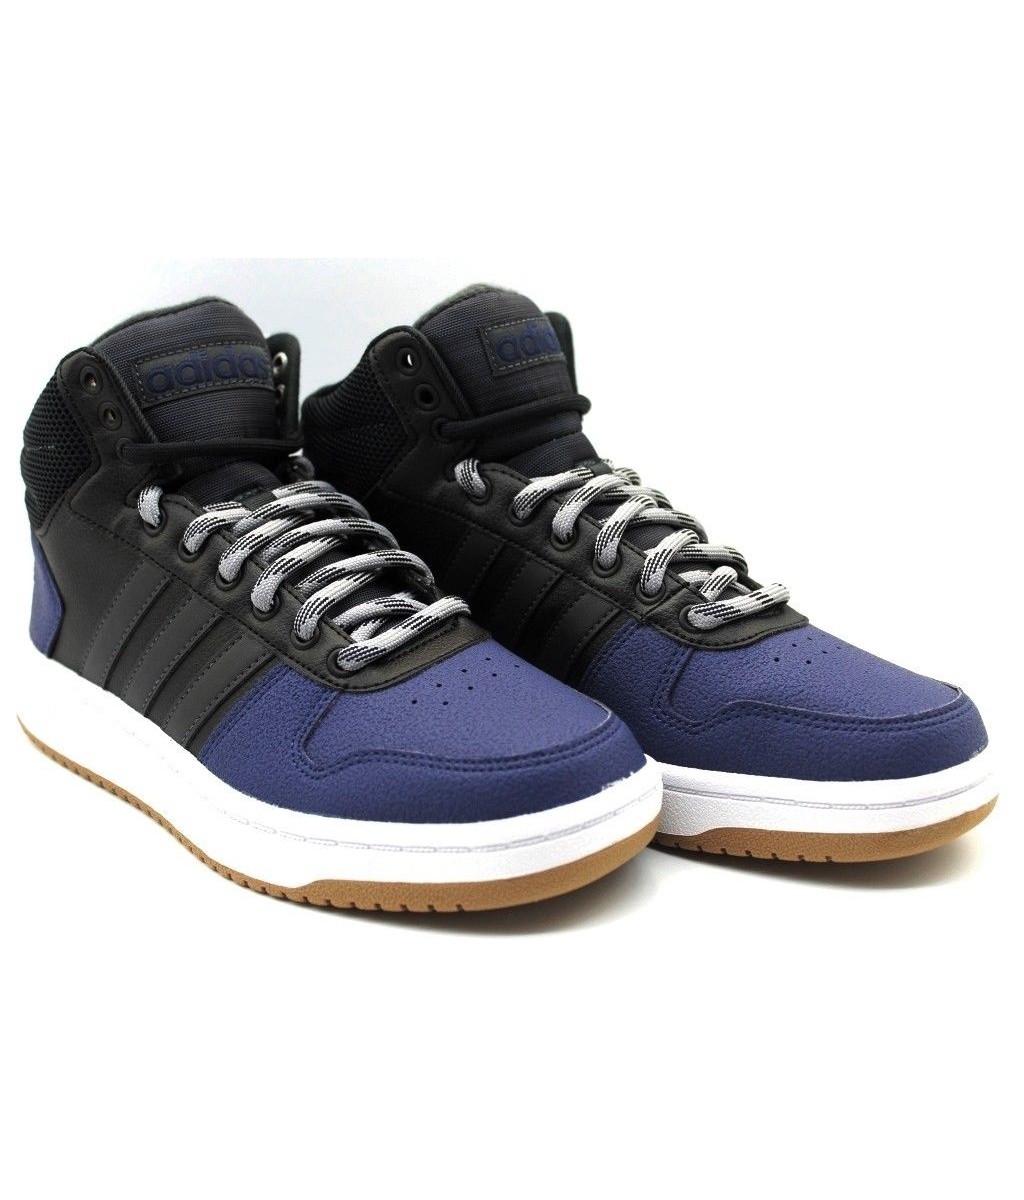 Adidas pantofole de deporte deportivos blu tobillo alto aros 2.0 medio 2018   Economico E Pratico    Scolaro/Ragazze Scarpa